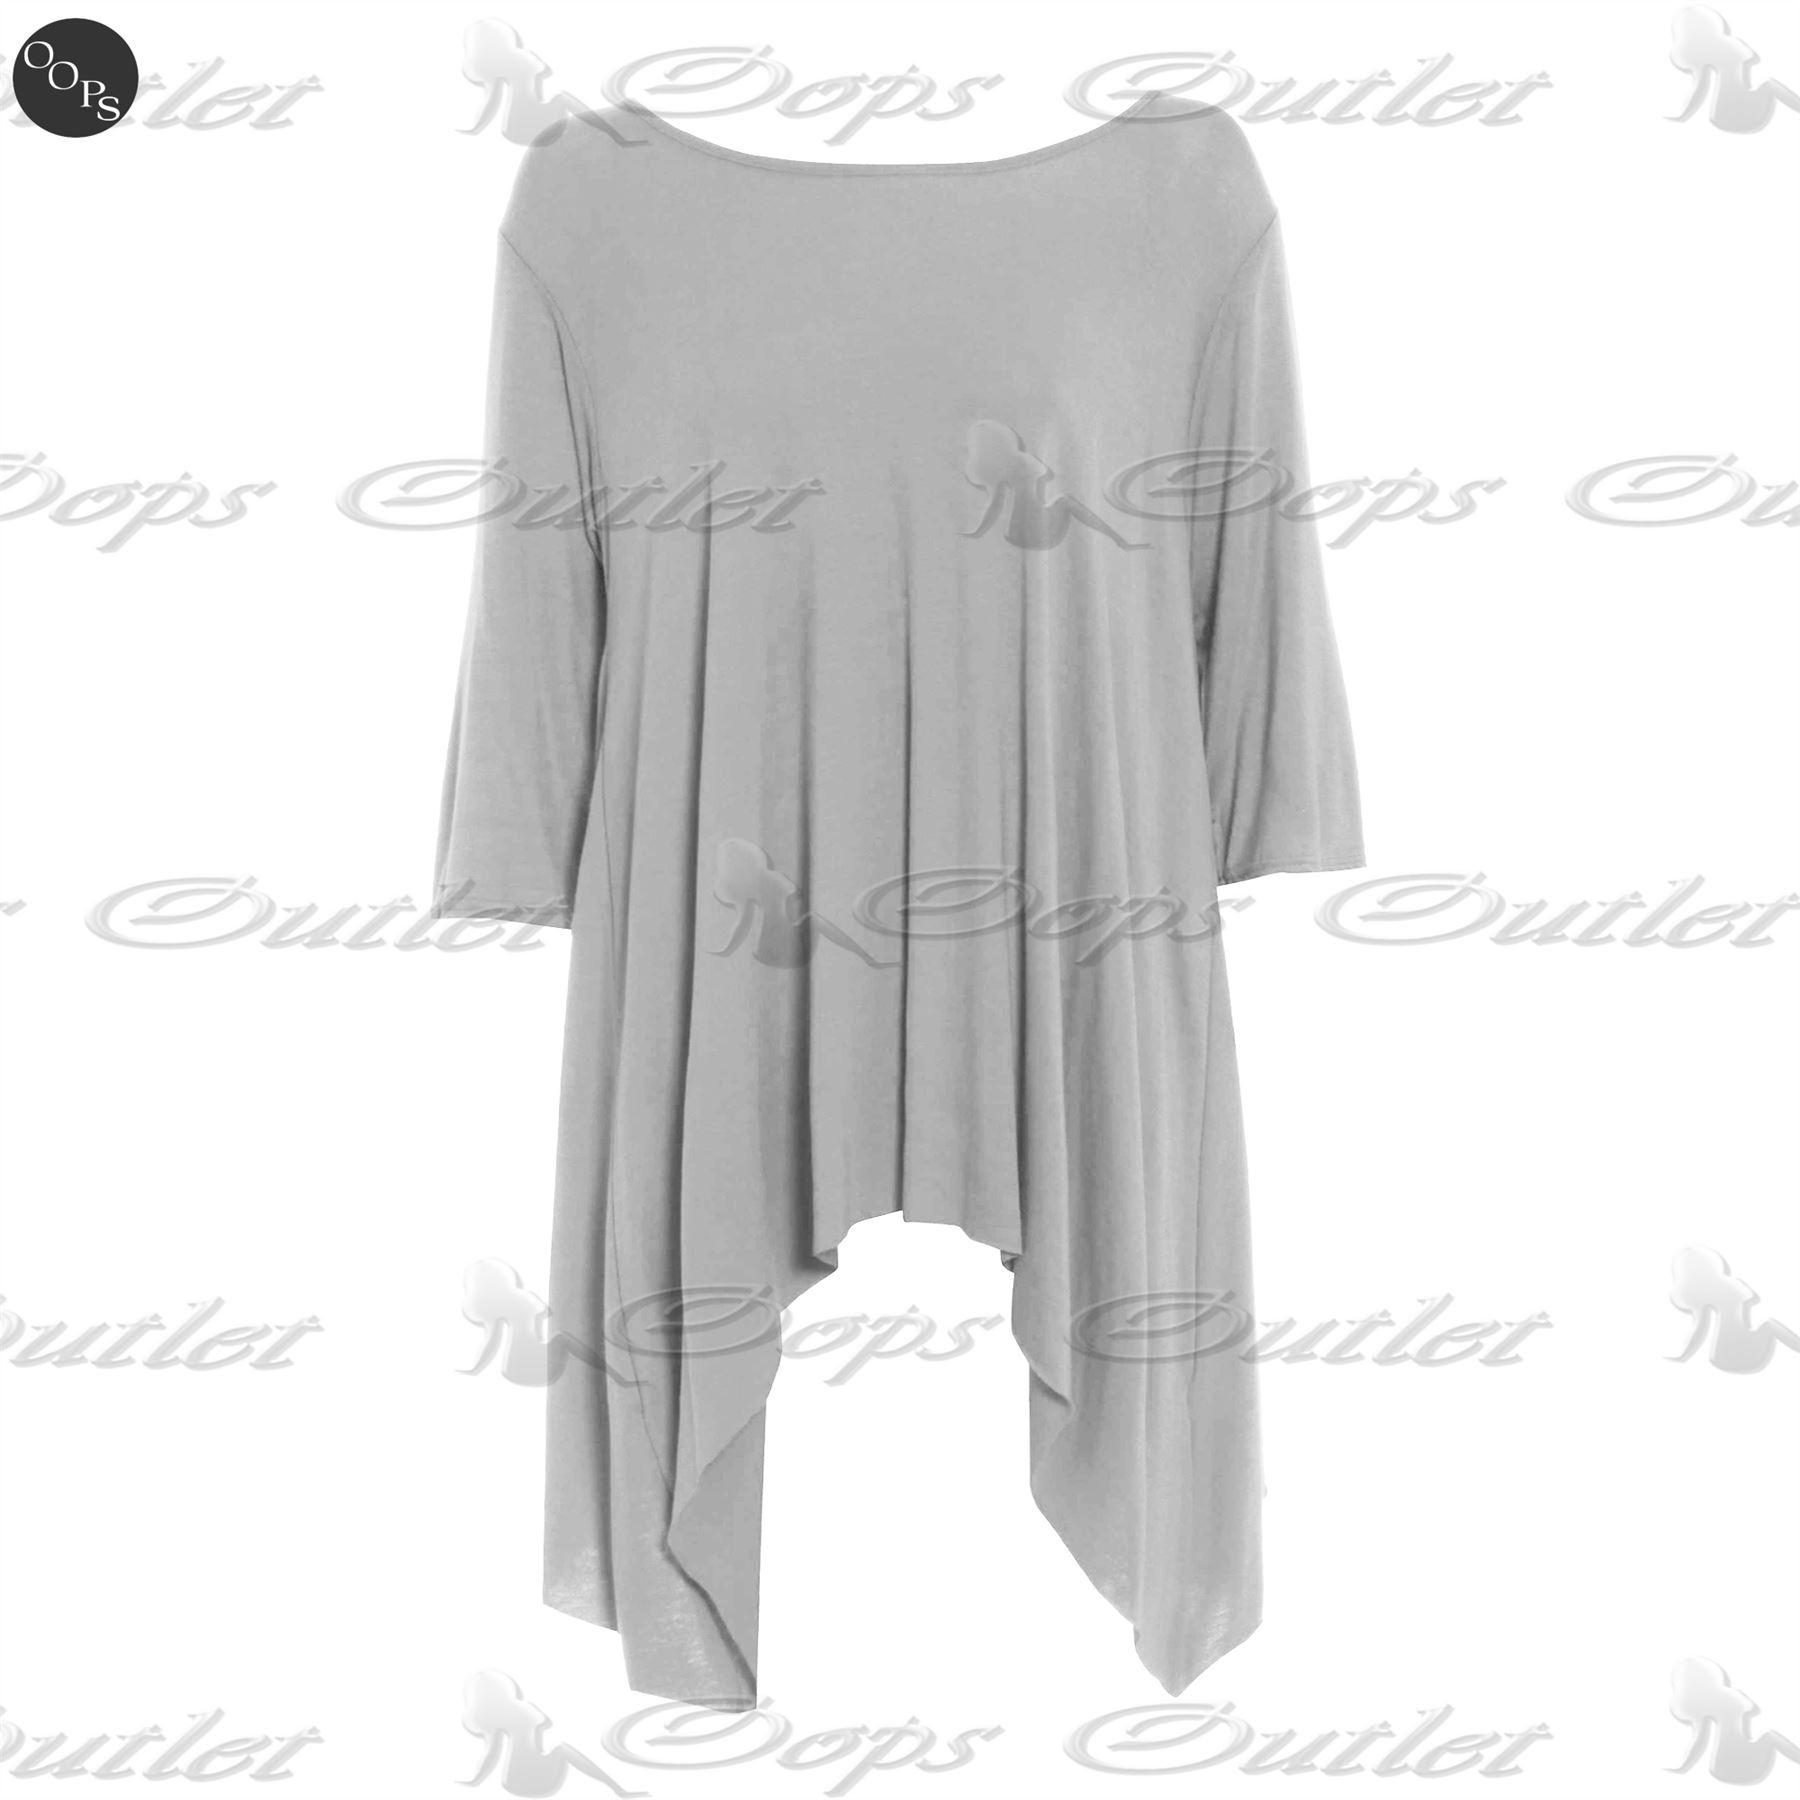 Womens Ladies Plain Flared Waterfall Swing Hanky Hem Long Top Dress Plus Size